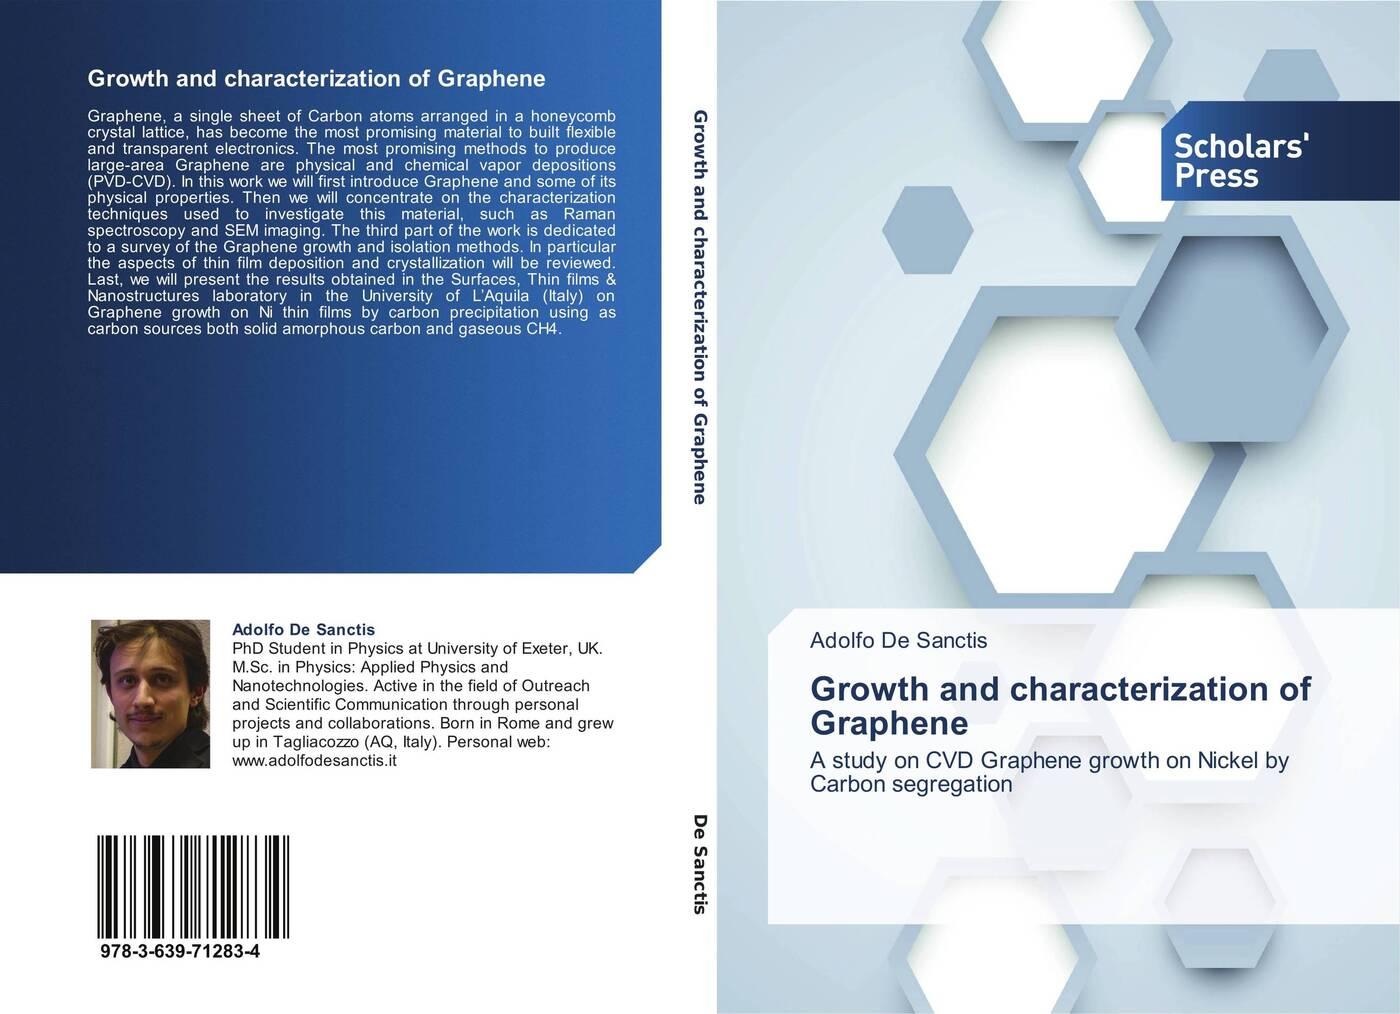 Adolfo De Sanctis Growth and characterization of Graphene стоимость